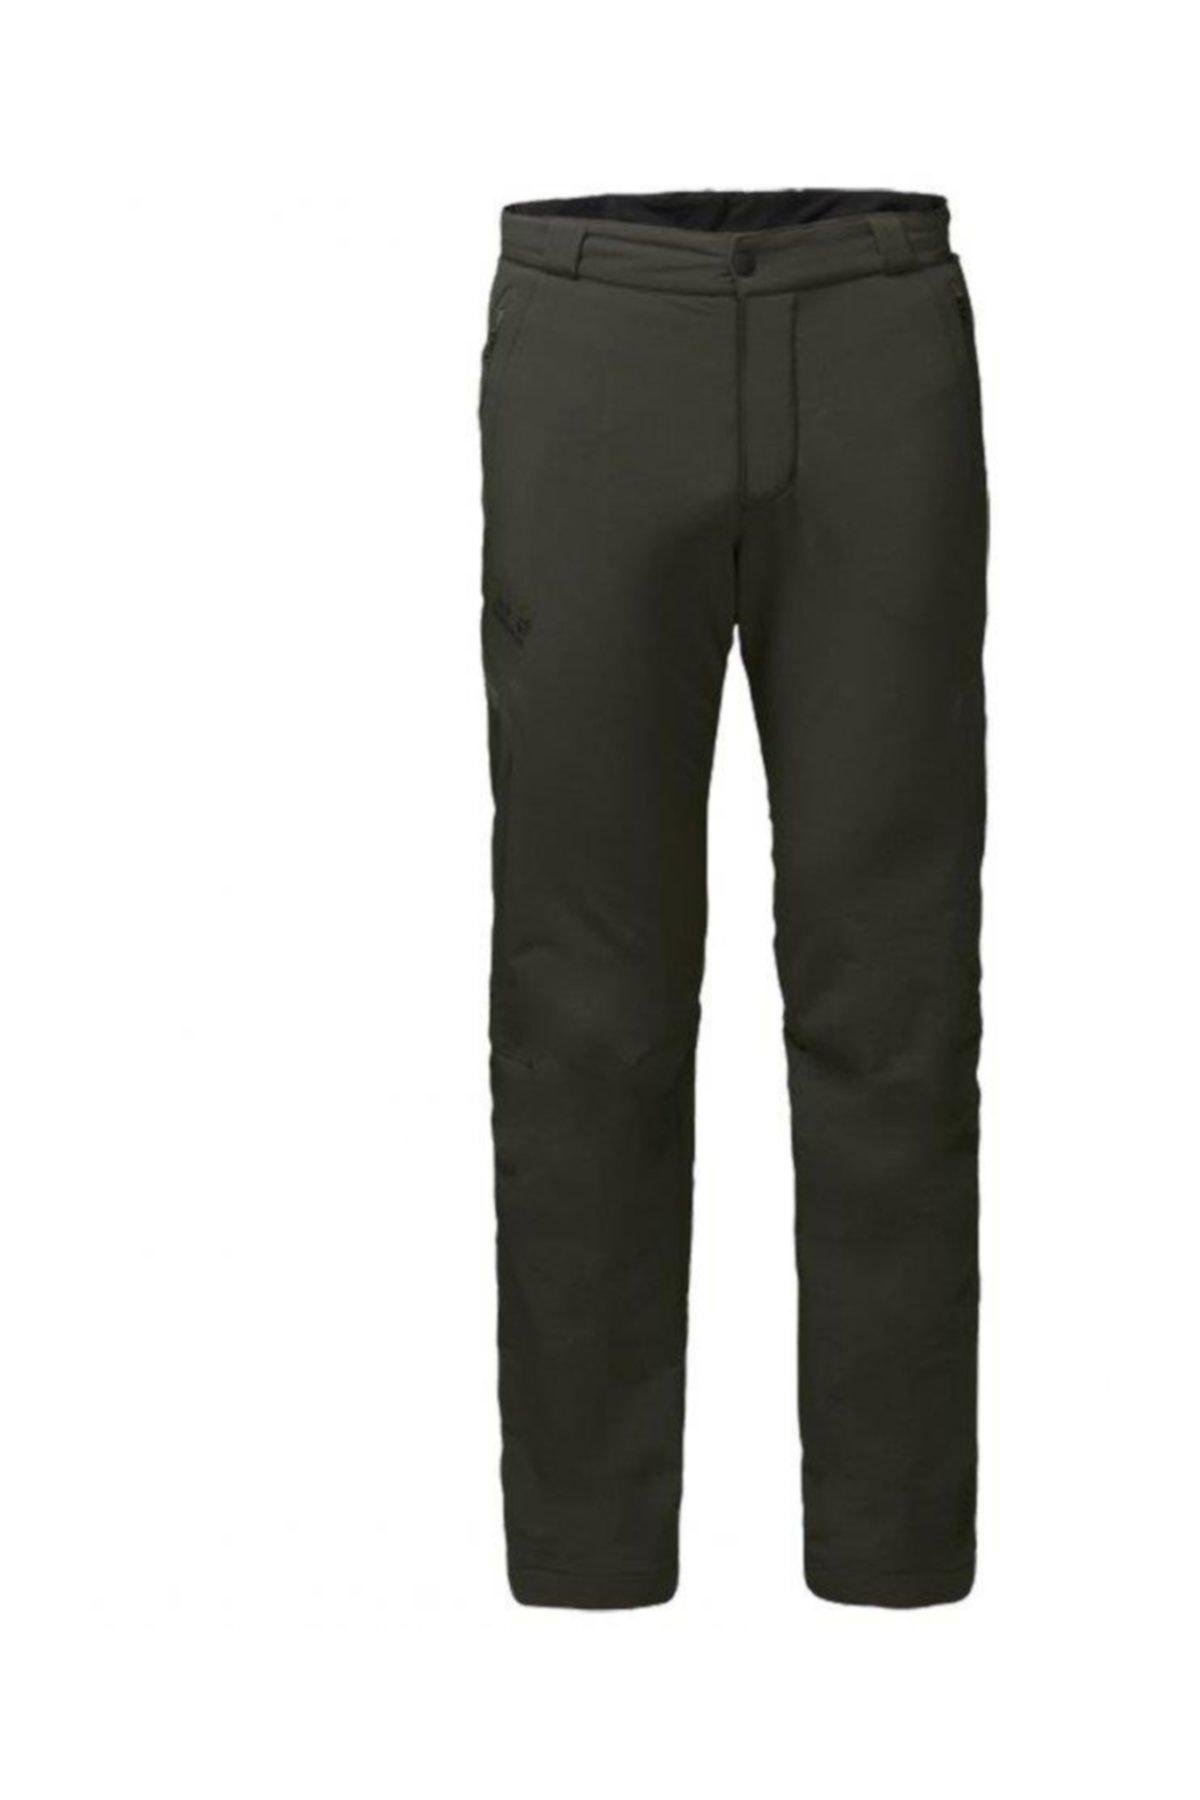 Jack Wolfskin Activate Thermic Pants Erkek Pantolon - 1503601-5515 1